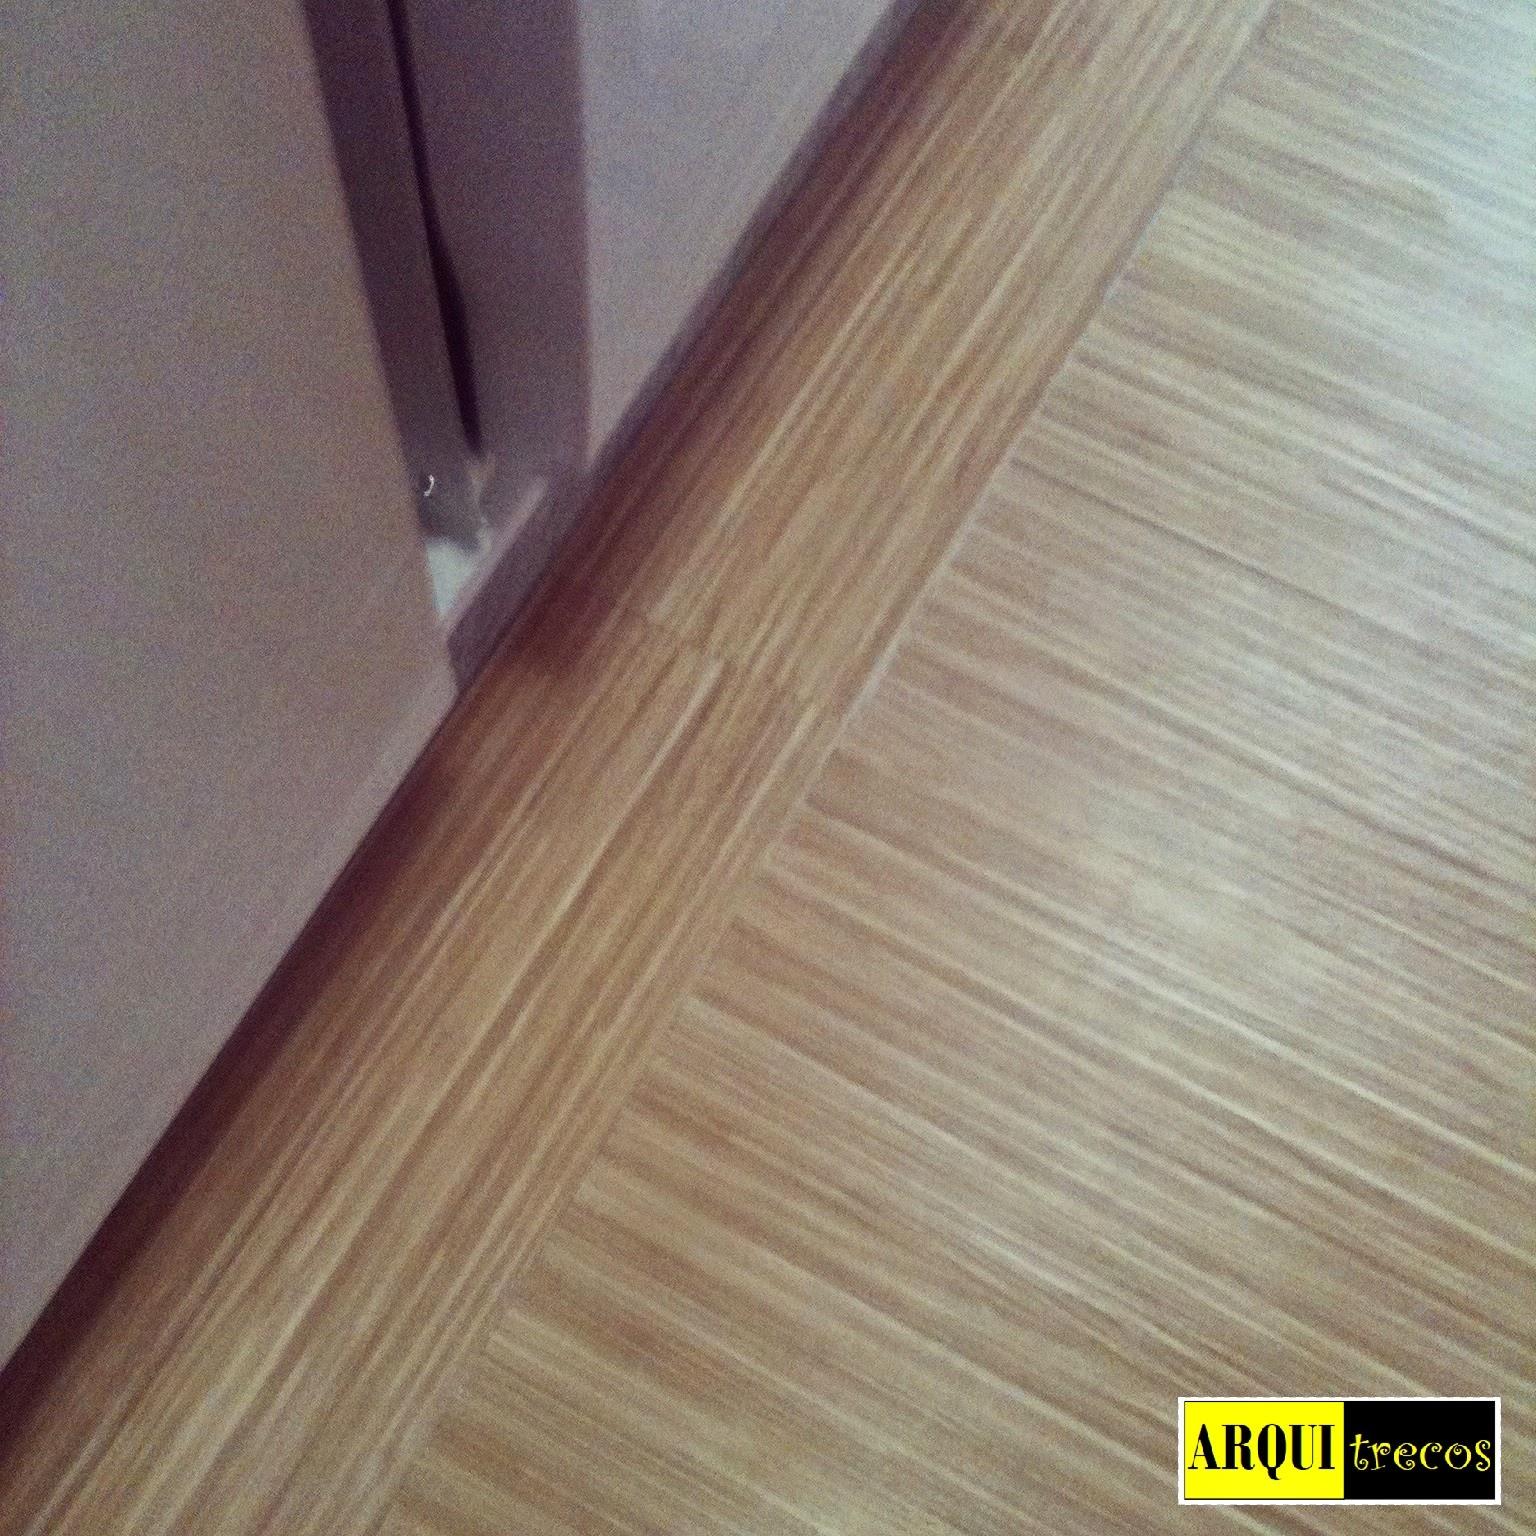 Como colocar piso no chao como instalar piso laminado - Colocar piso vinilico ...